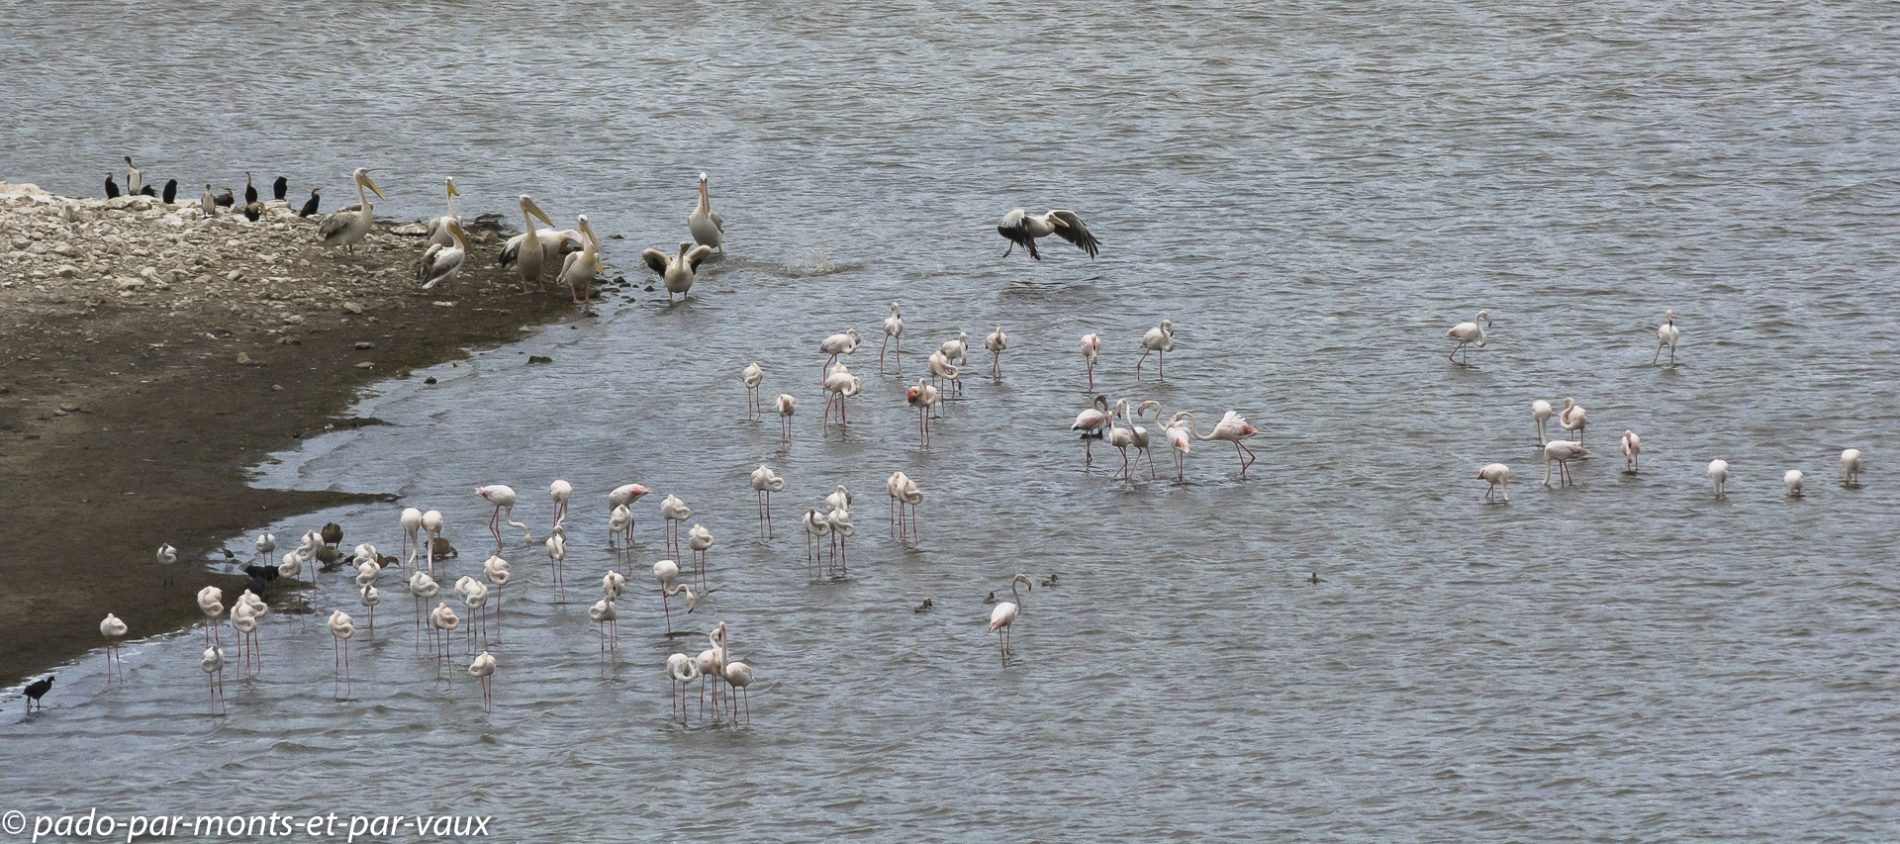 De Hoop Nature Reserve - Pélican blanc et Flamants